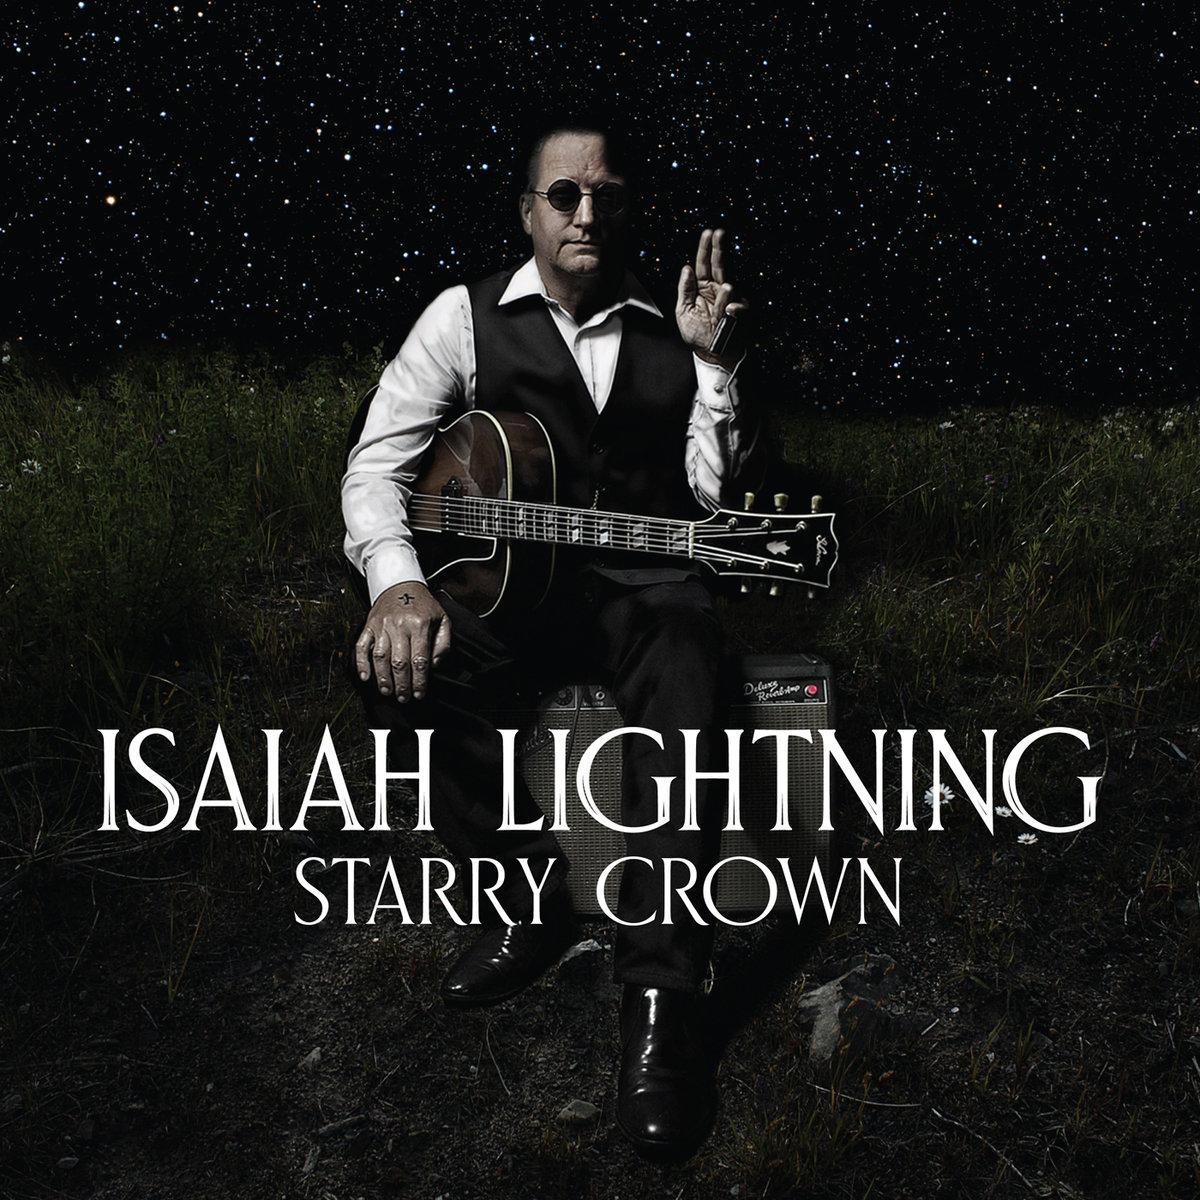 isaiahlightning_starrycrown.jpg